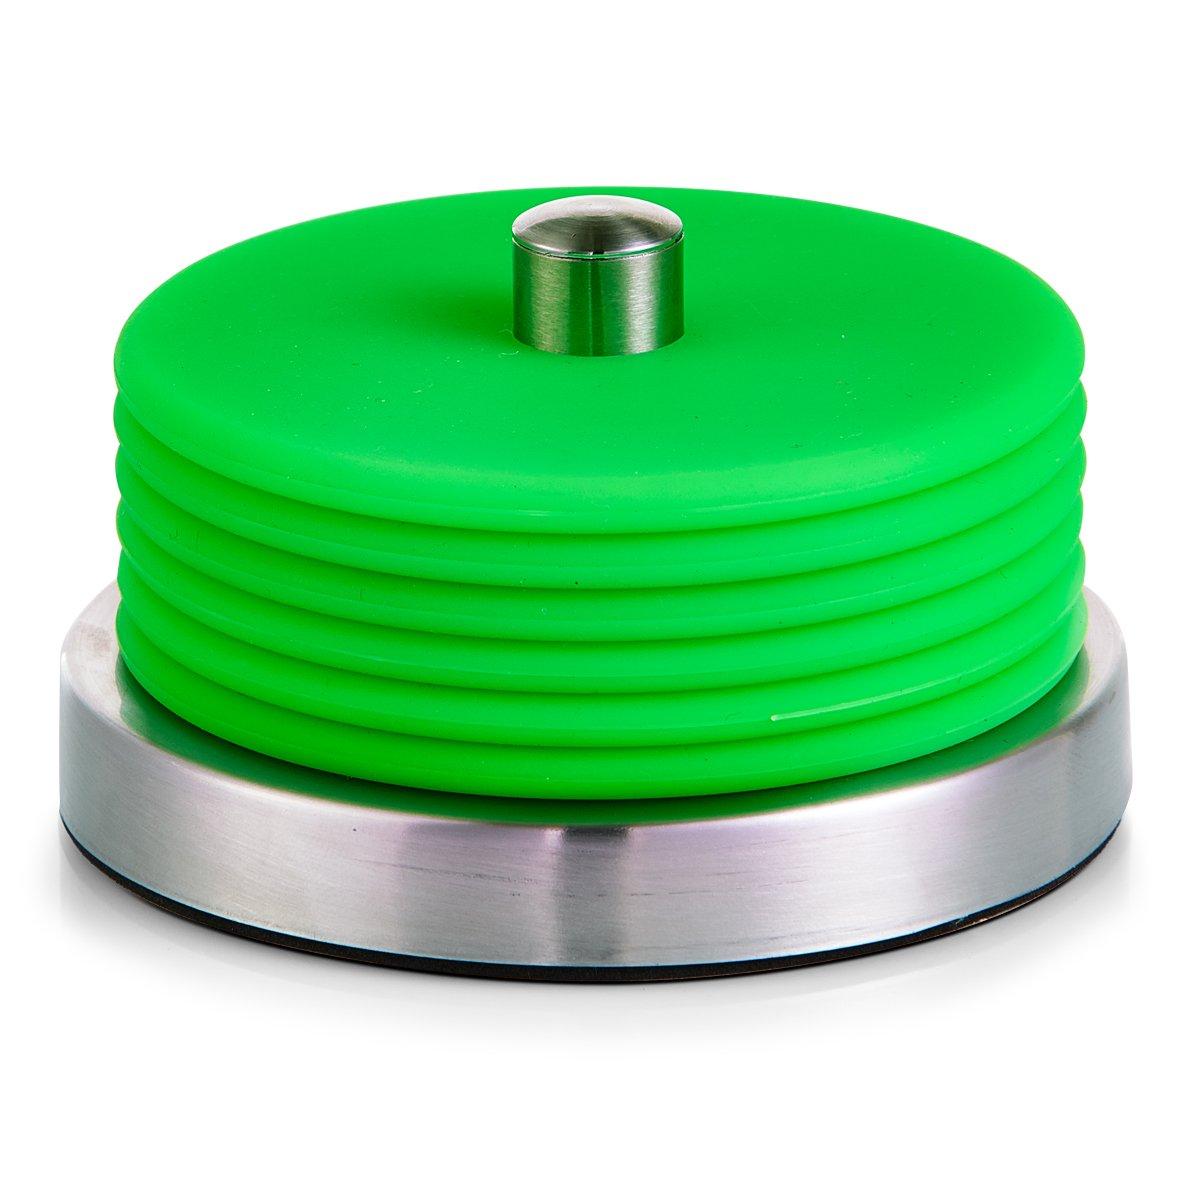 Zeller 2057967 Dessous de Verre Vert 10 x 6 cm 27222